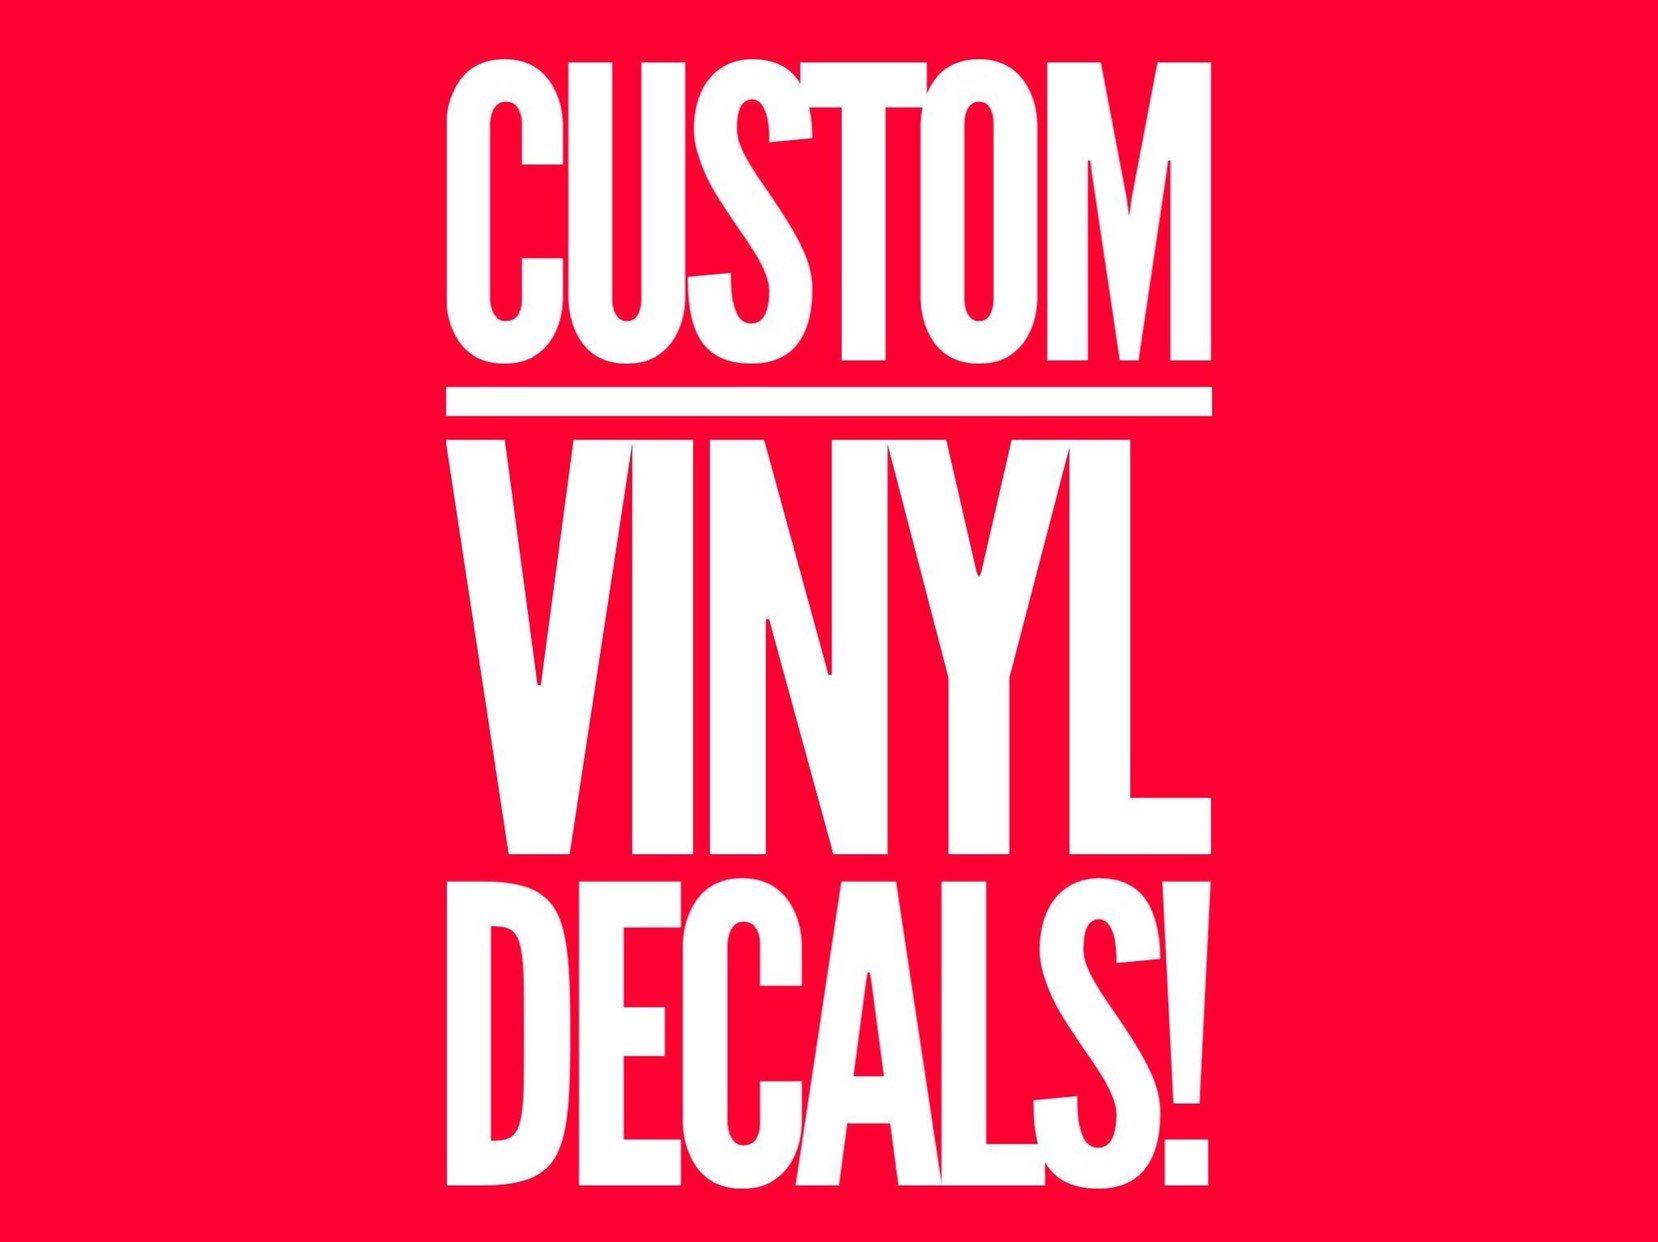 Design Your Own Decal Custom Logo Vinyl Decals Custom Vinyl Decals Design Your Own Vinyl Custom Wedding Favors Logo Vinyl Stickers Custom Logos Custom Wedding Favours Adhesive Vinyl